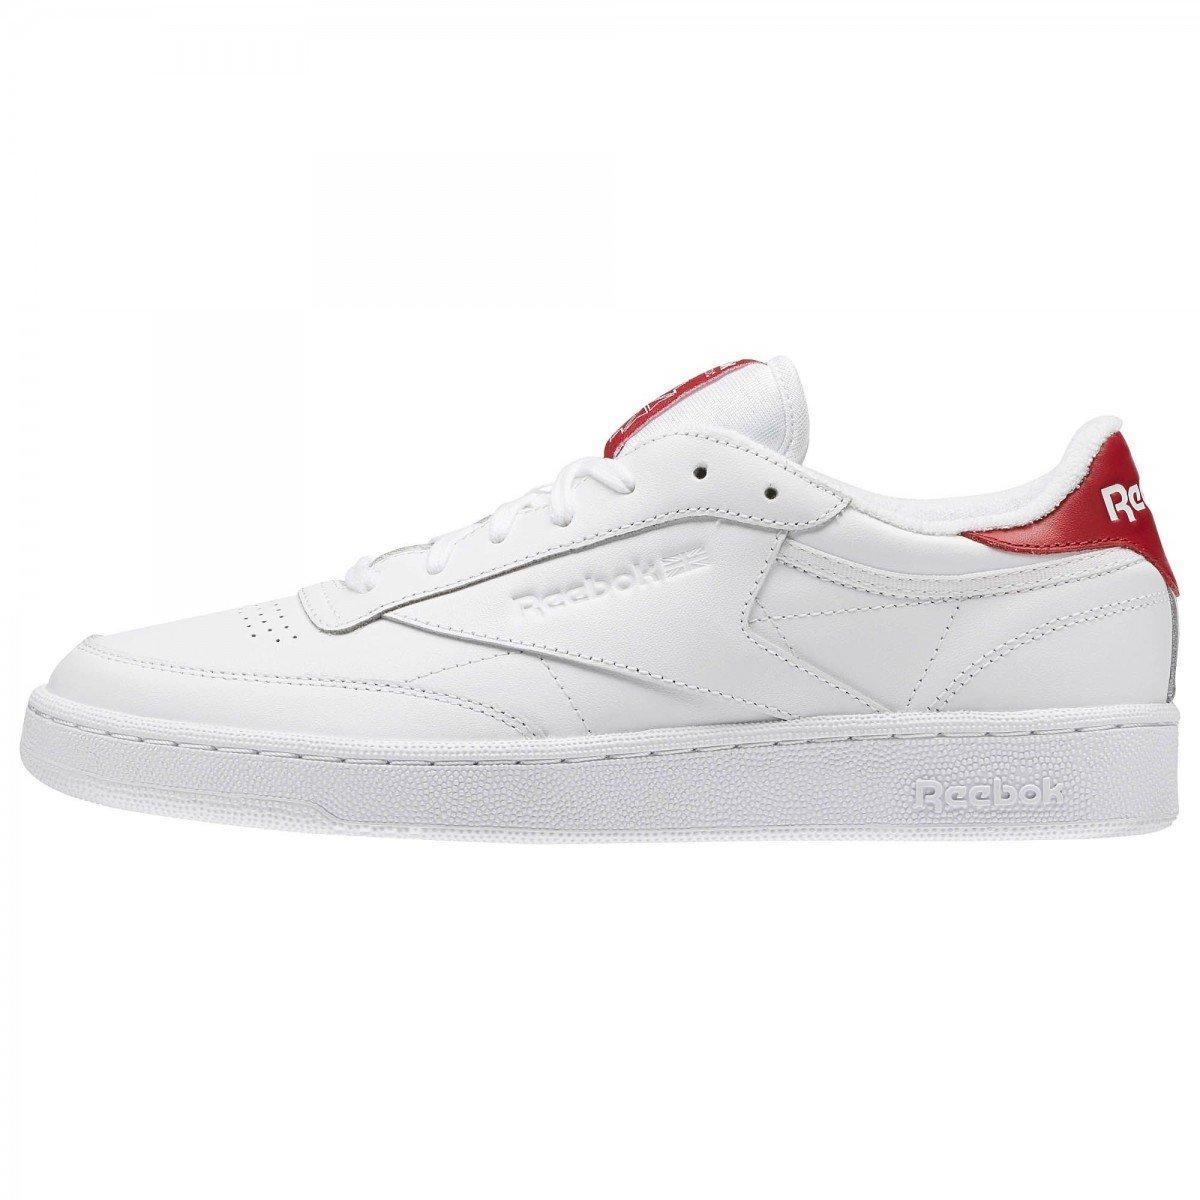 Reebok Herren Schuhe / Sneaker Club C 85 EL  45 EU White/Exclnt Red